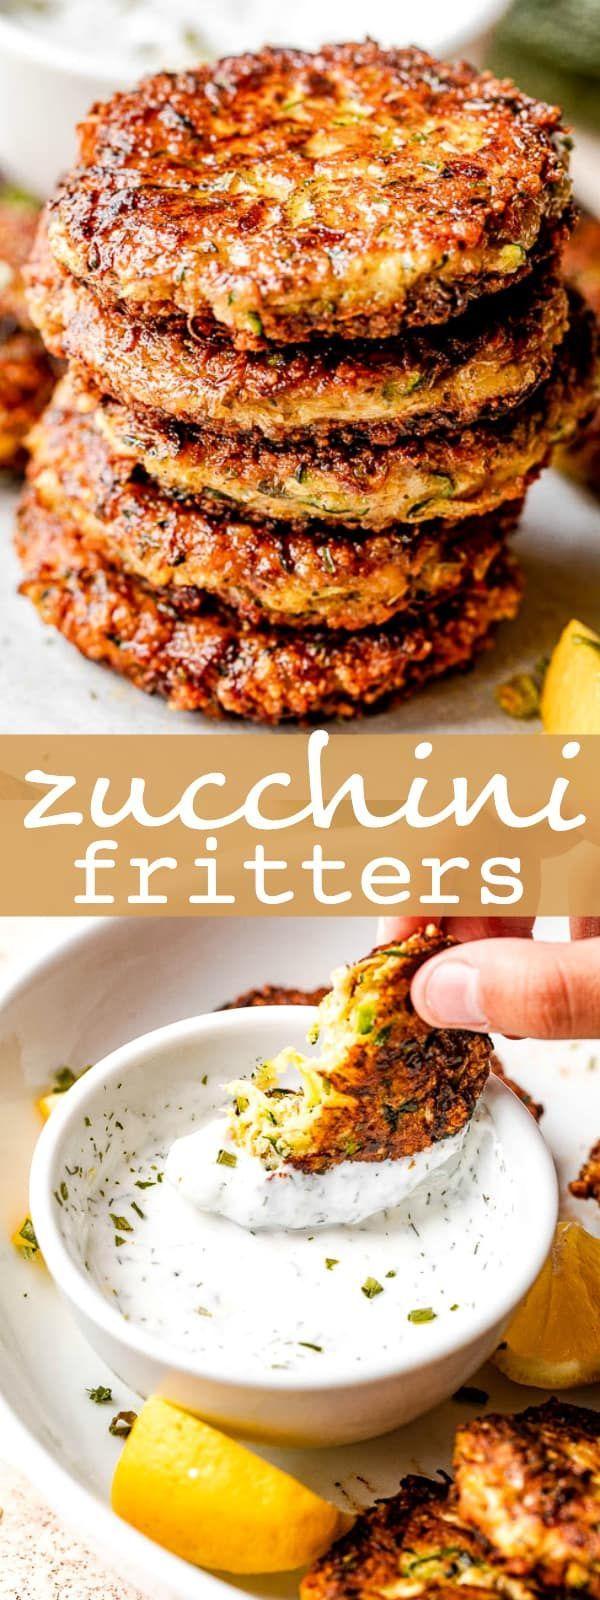 Crispy Zucchini Fritters Fried Zucchini Cakes With Sour Cream Dip In 2020 Fritters Zucchini Fritters Recipes